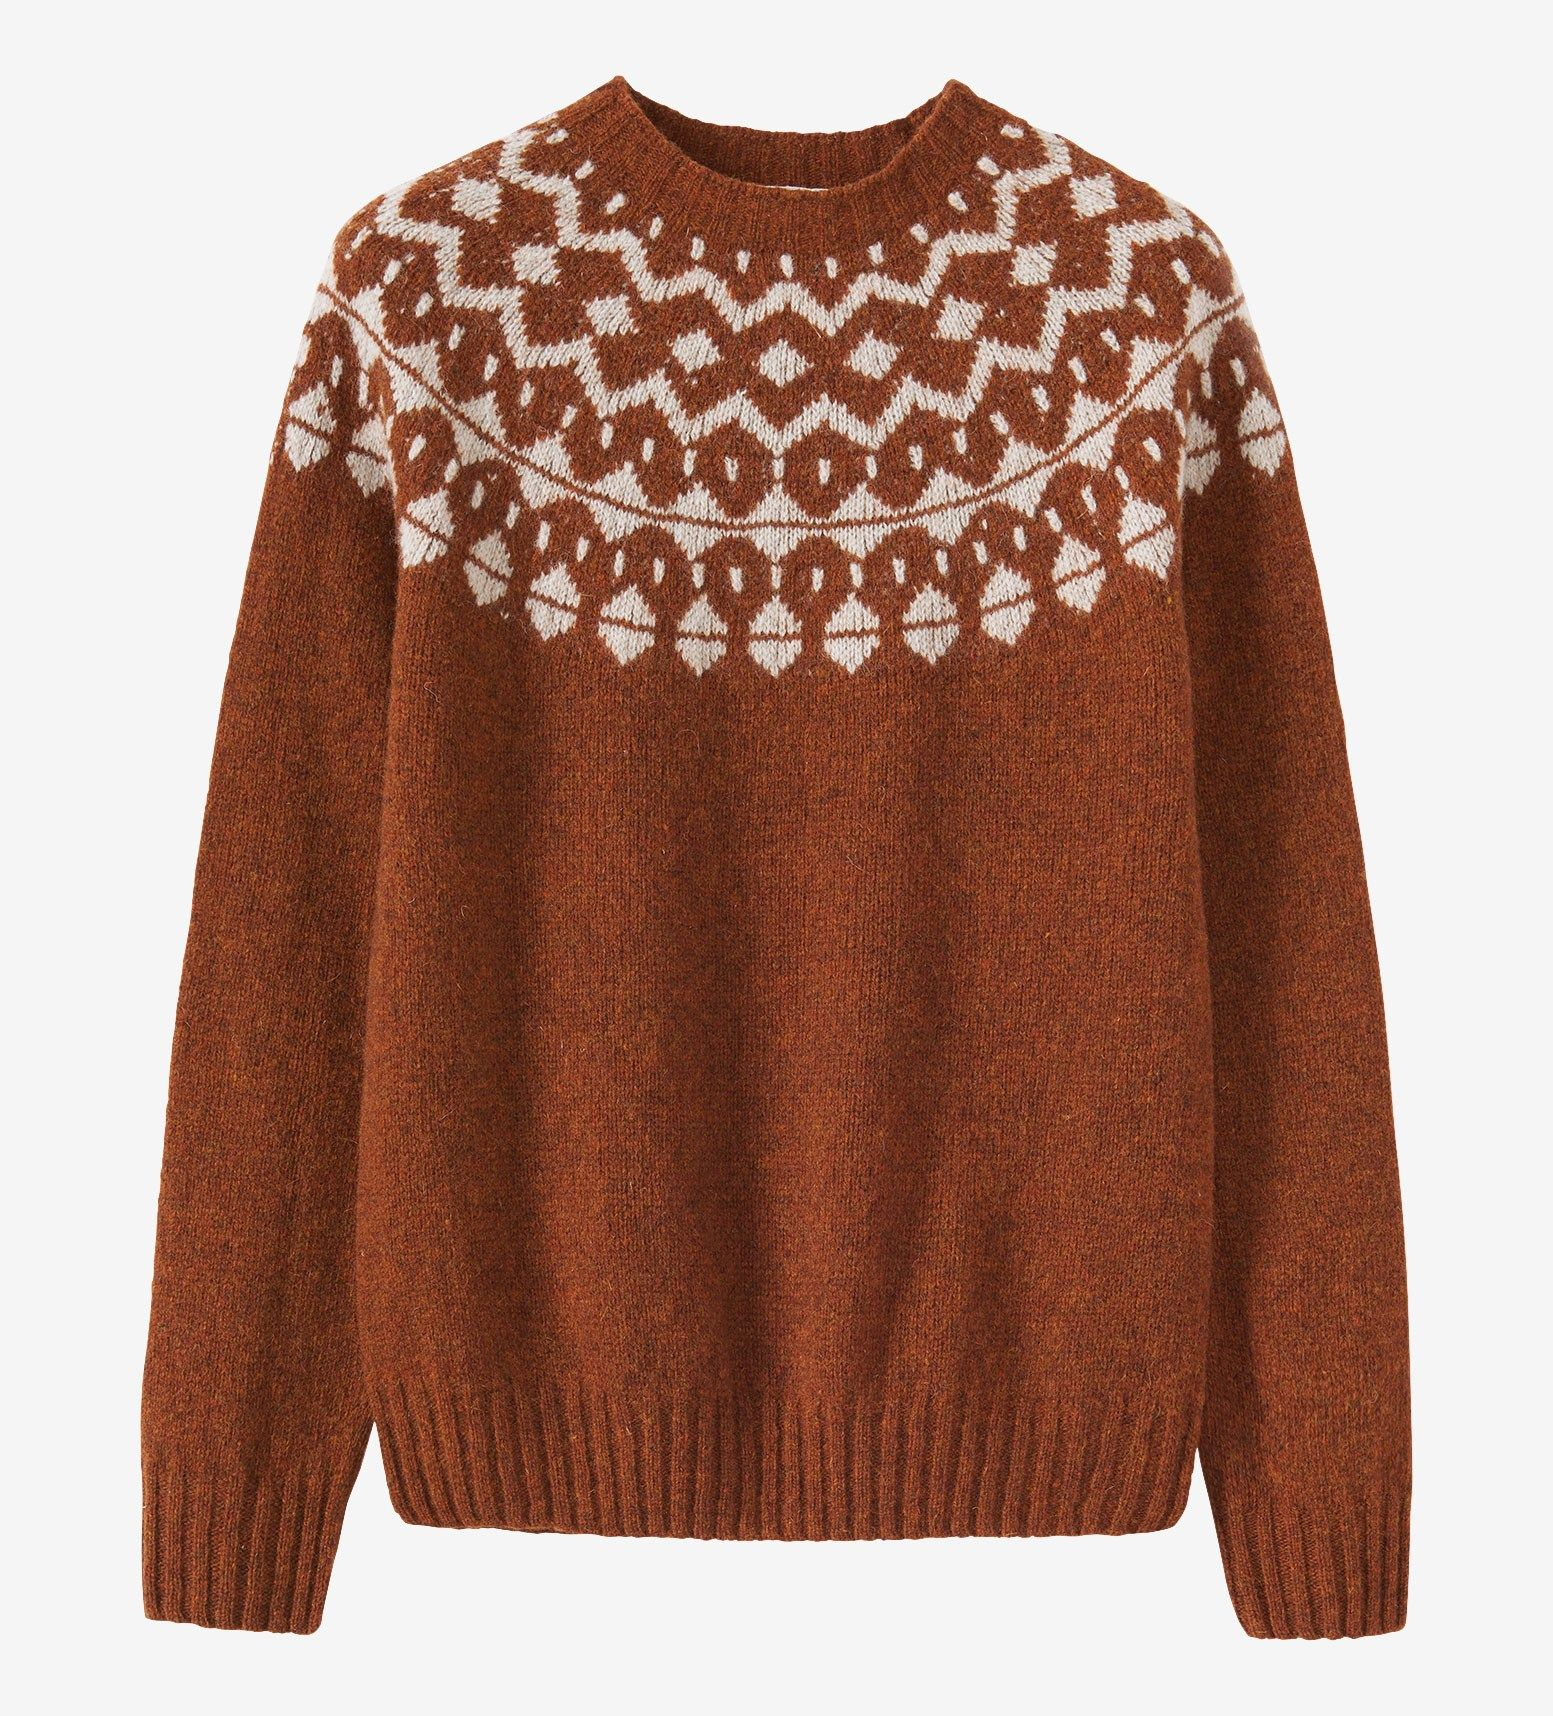 Seamless Fair Isle Yoke Sweater | Outfits | Pinterest | Early ...